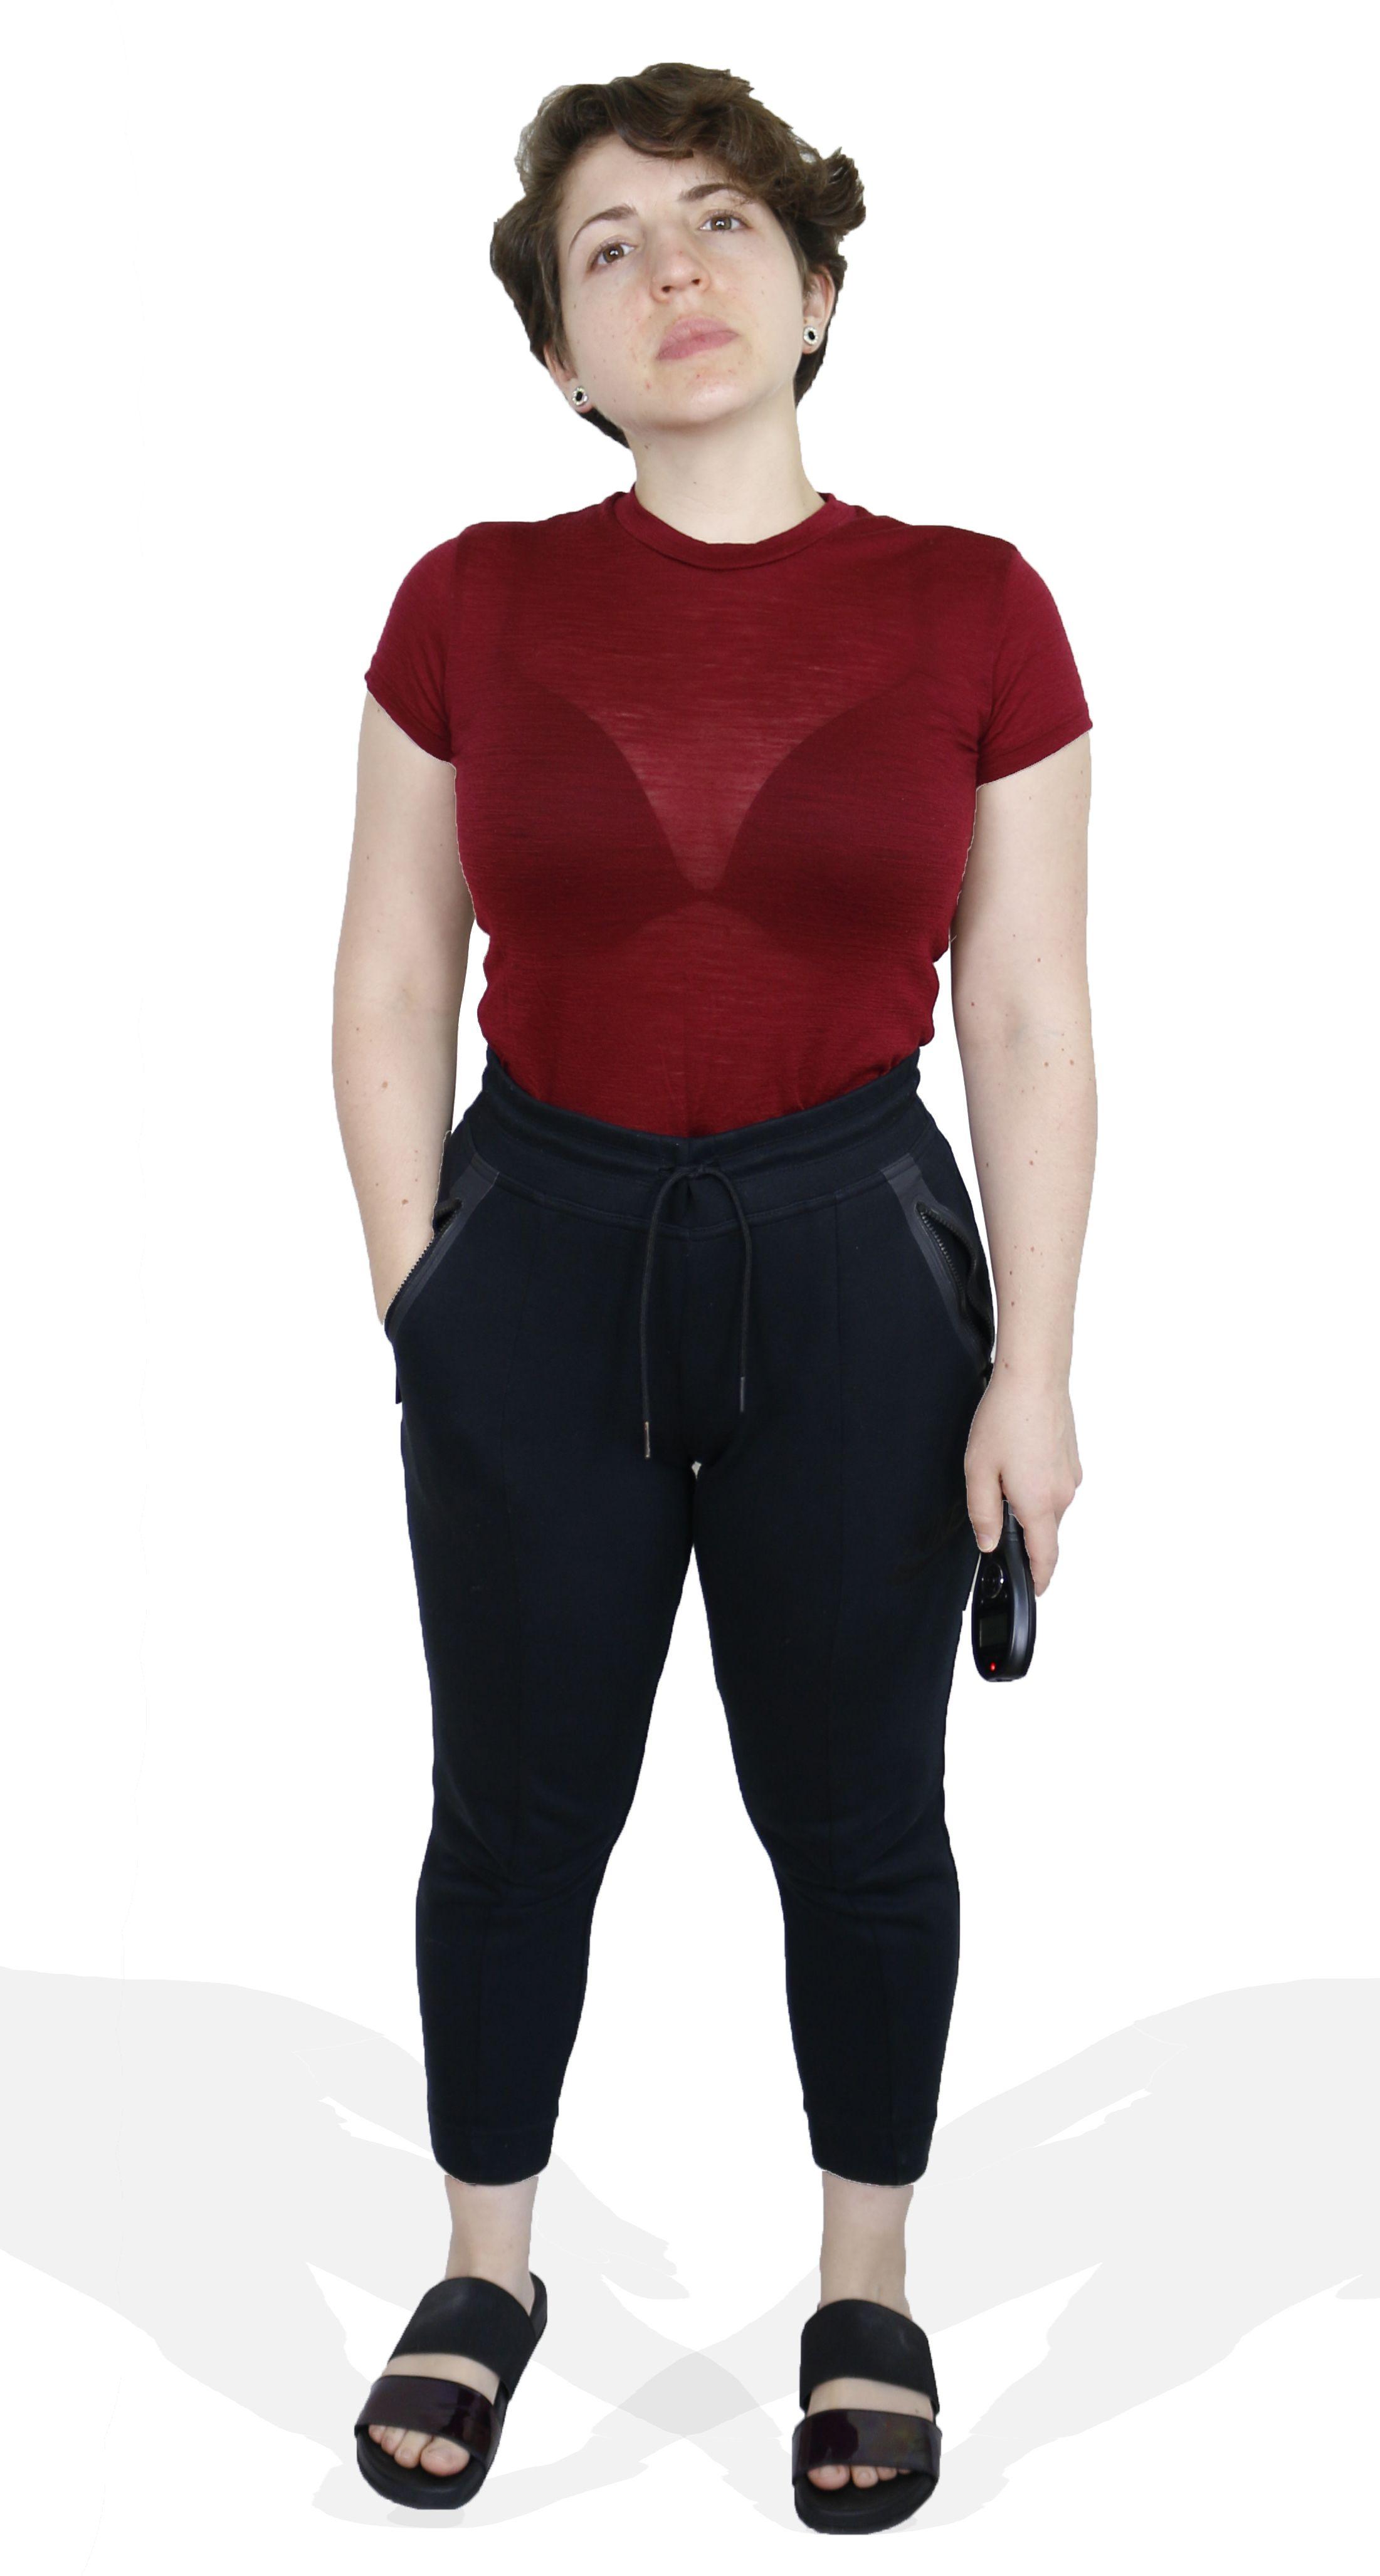 4 How to dress like a fashion designer. 1. Helmut Lang